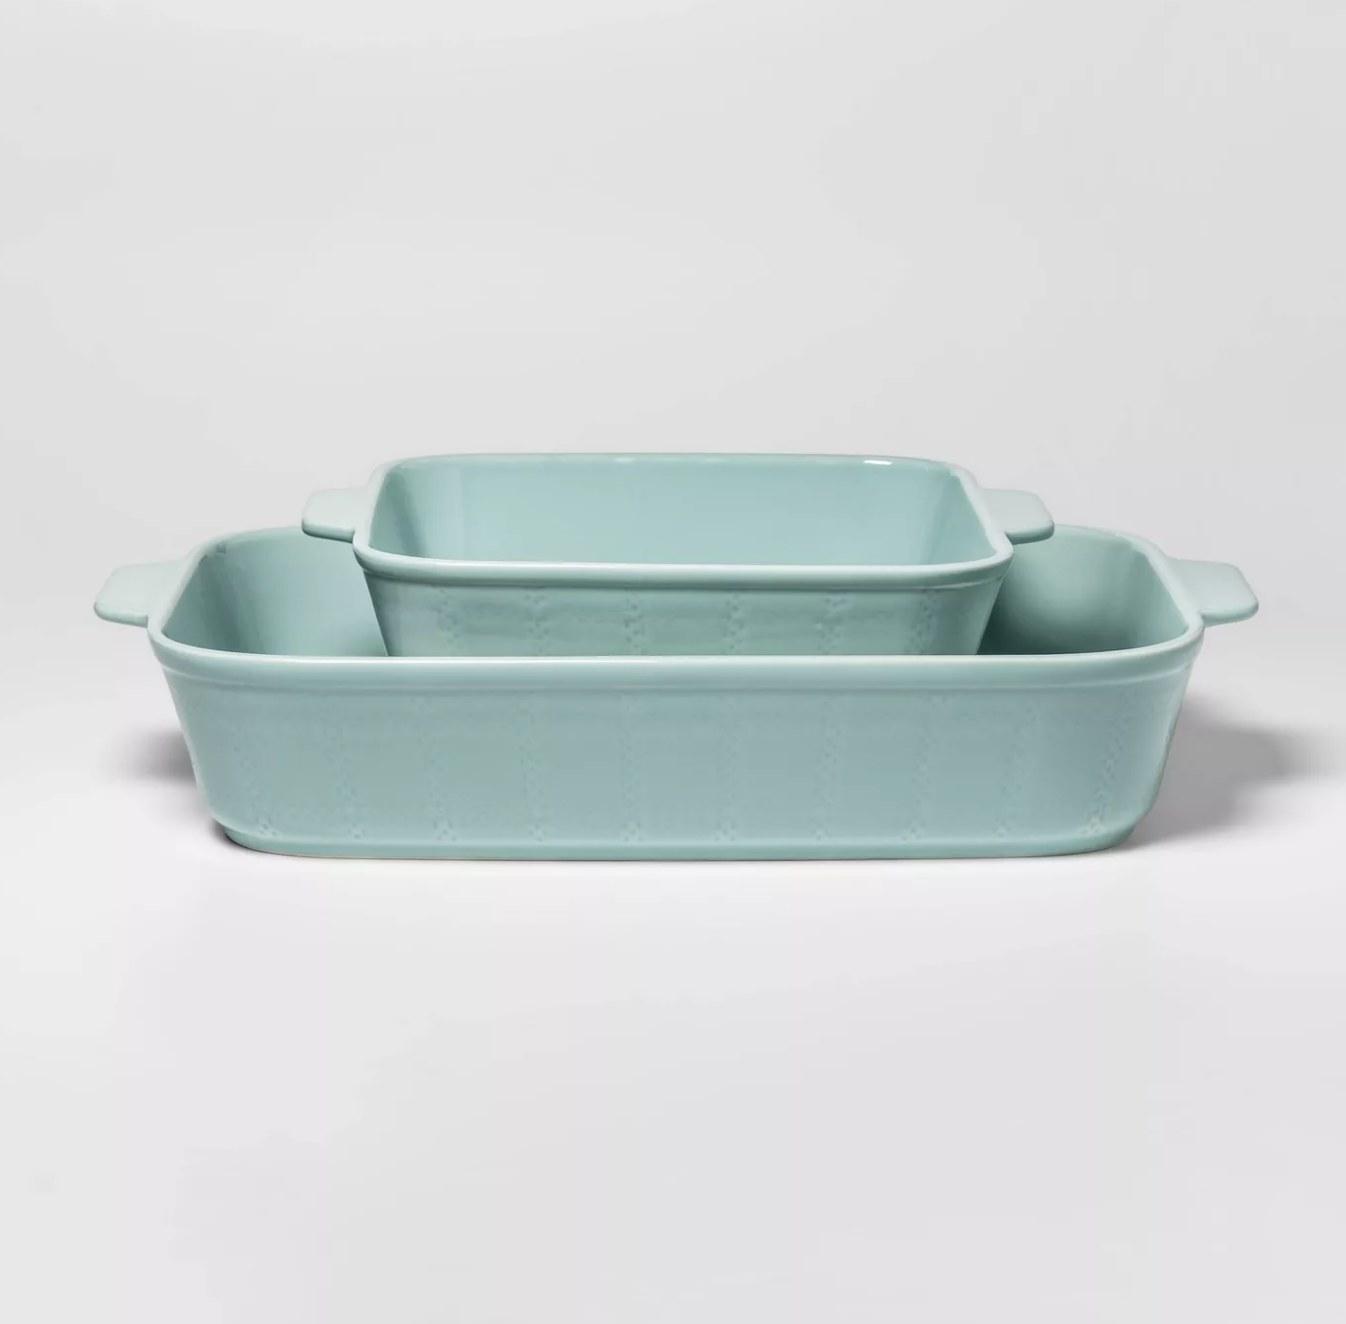 The light blue bakeware set